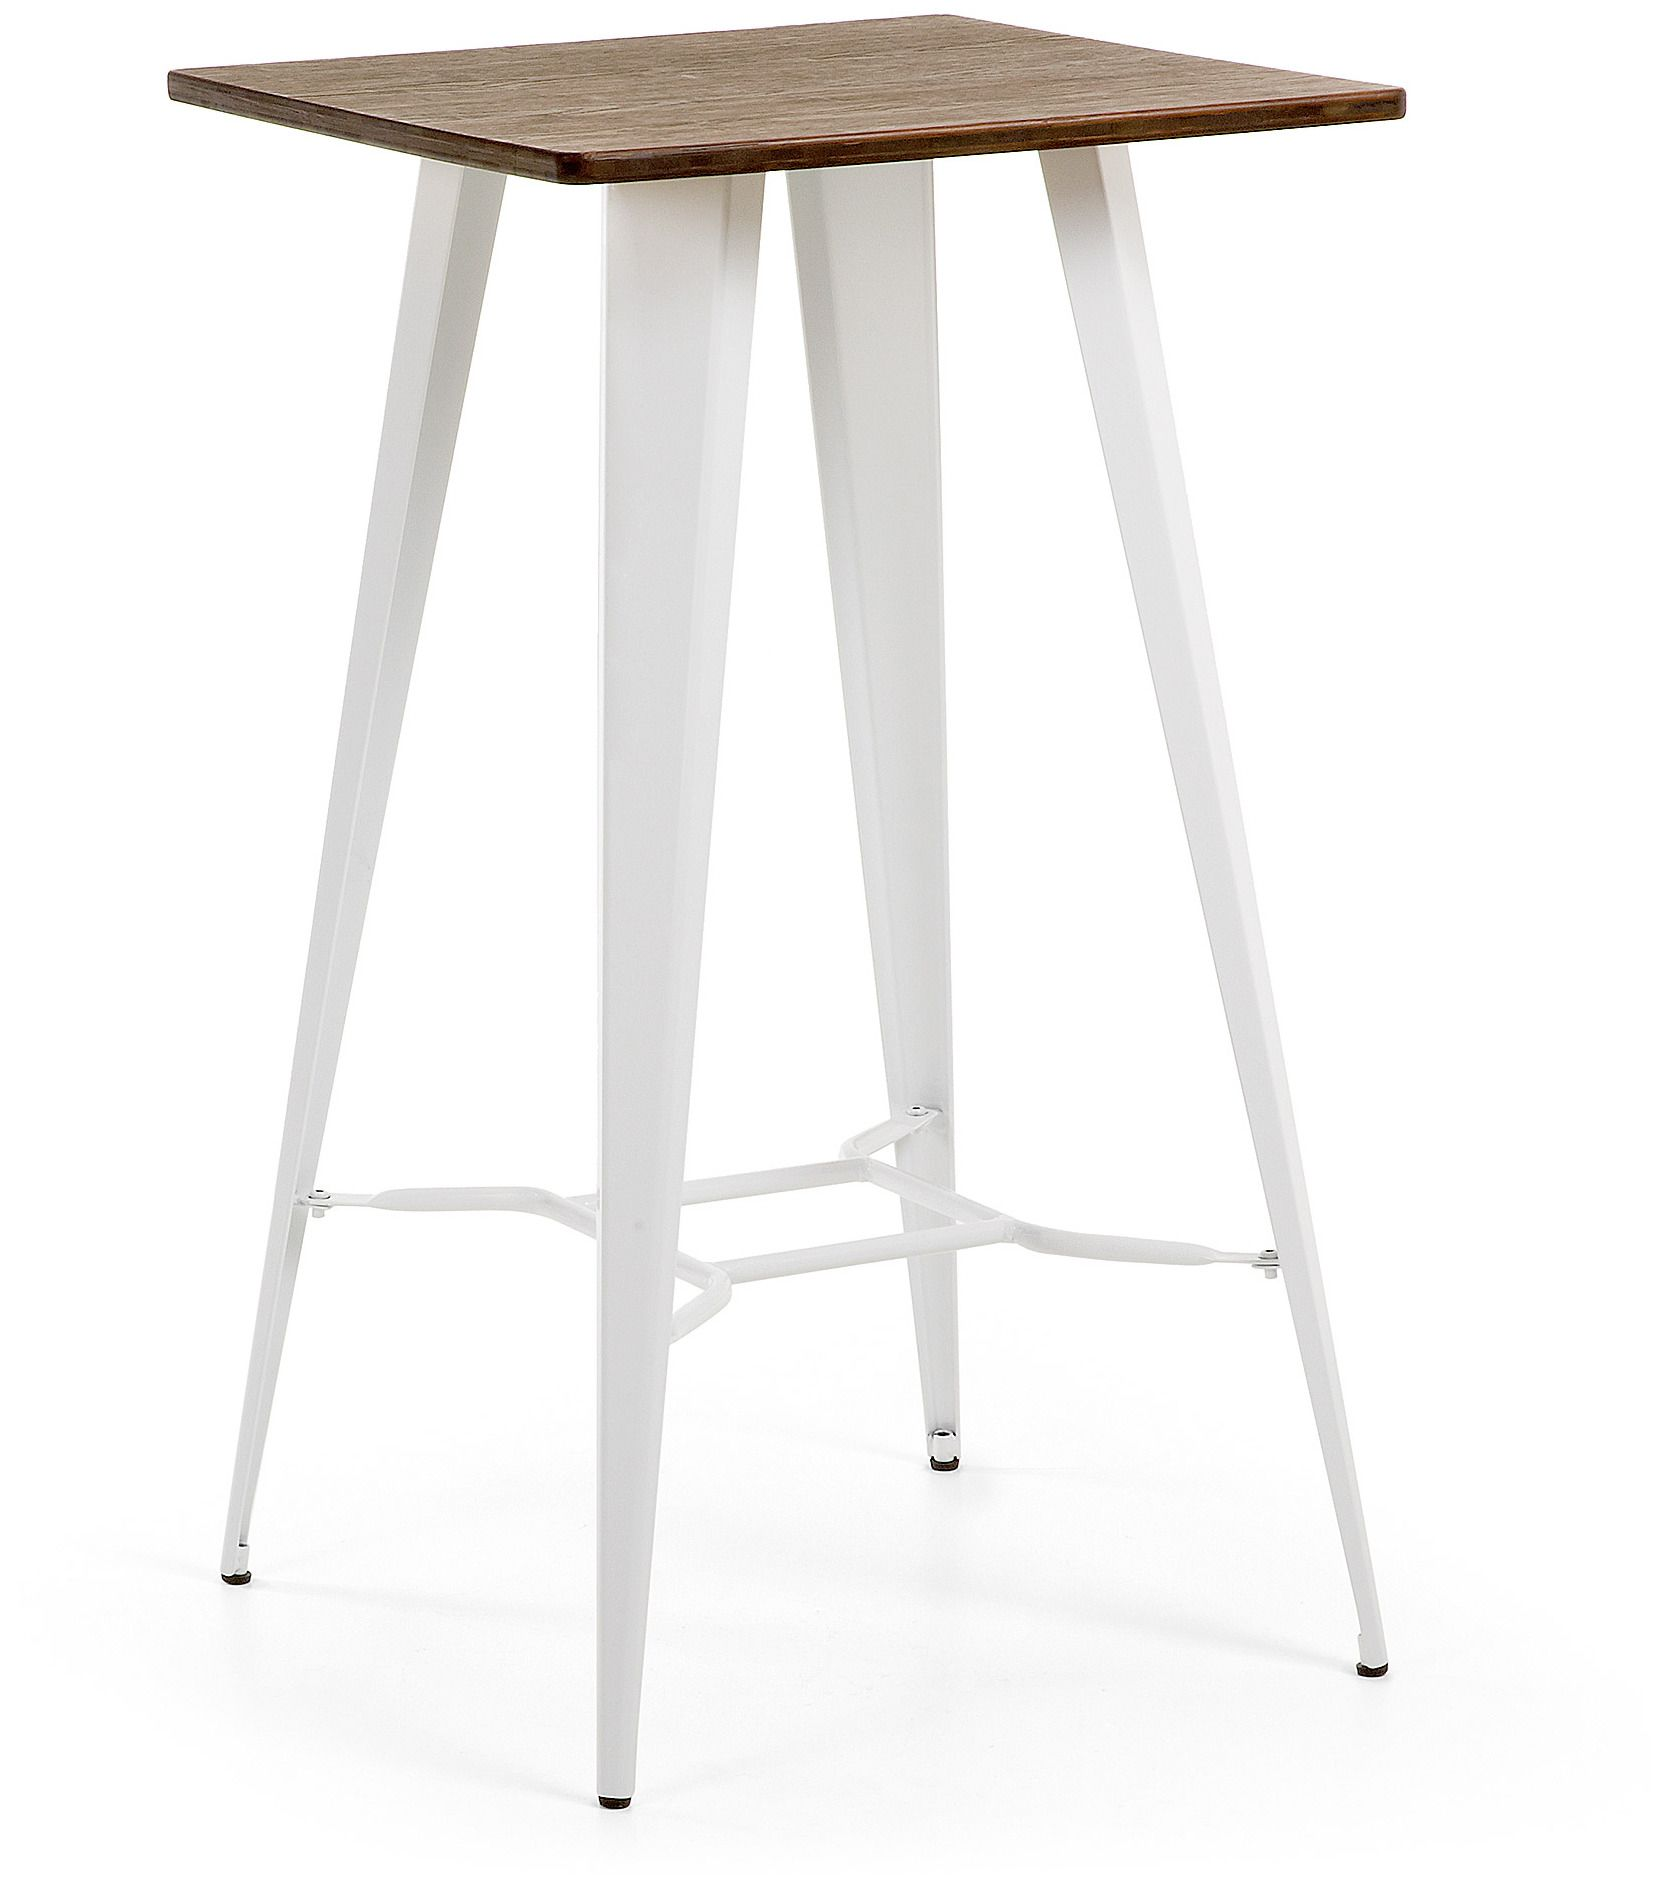 Laforma Malibu Pure White Metal Table 60x60 Mobilier Maison